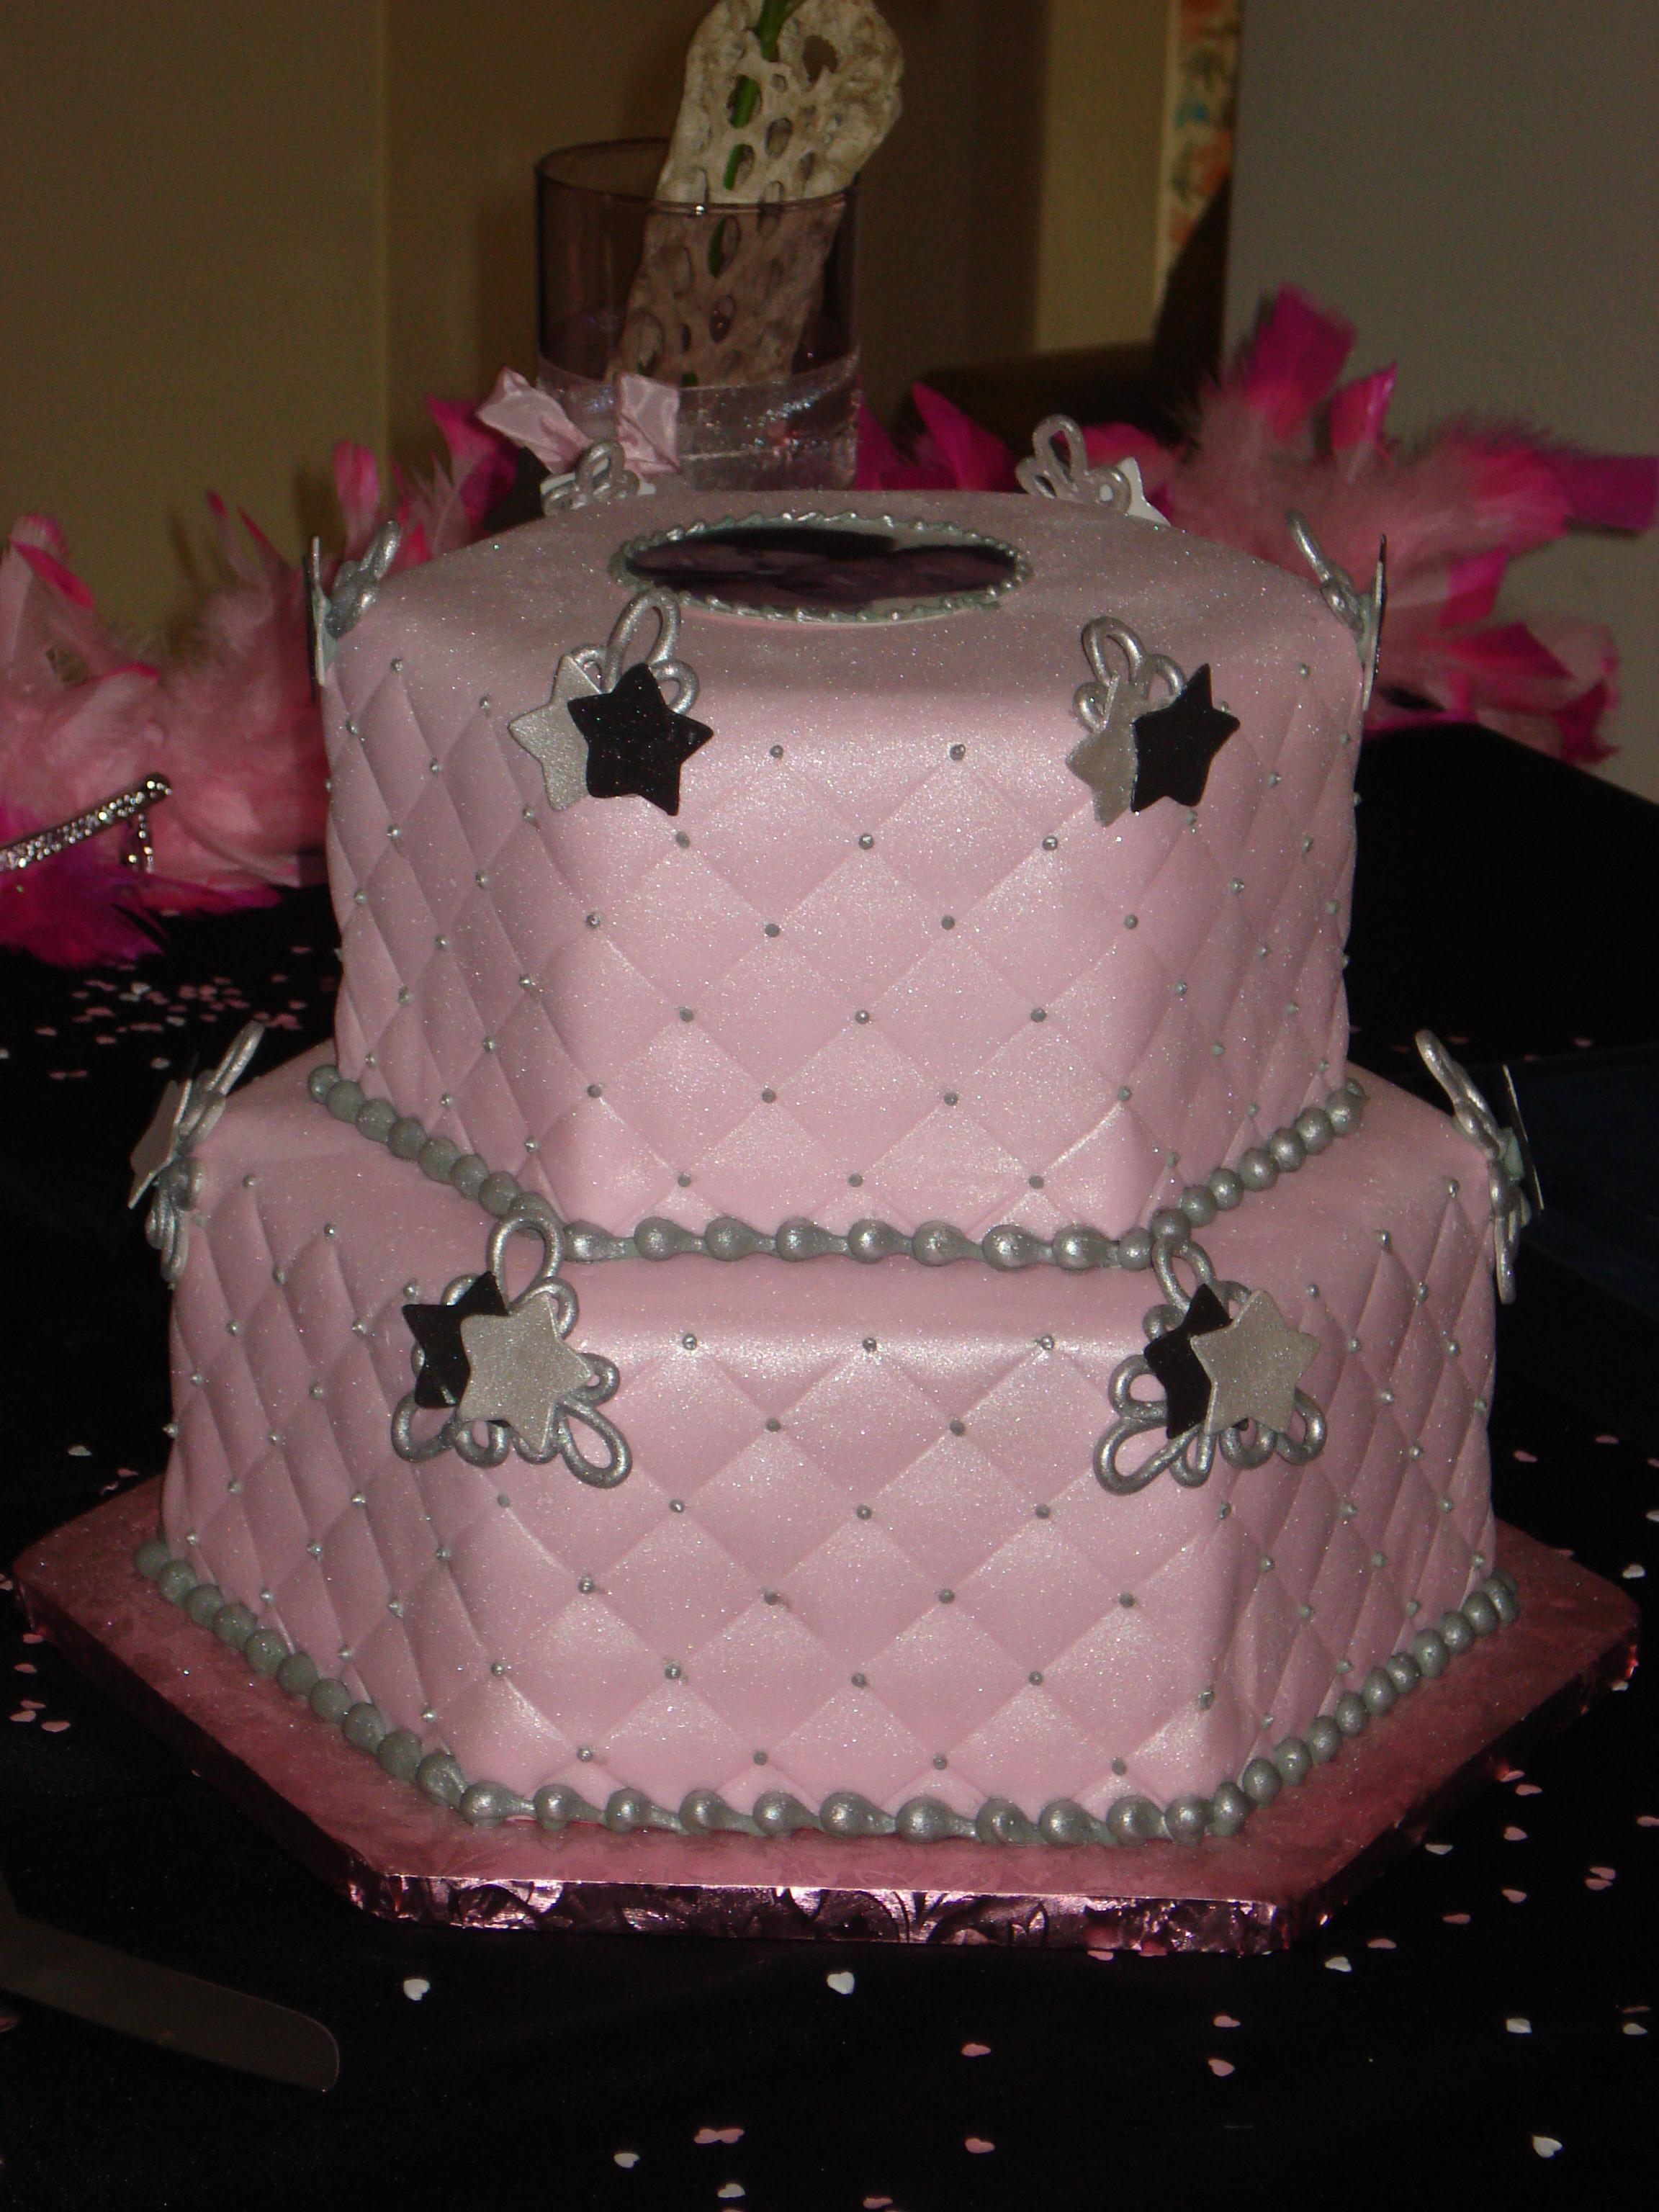 Hexagonal Bridal Shower with edible imagevendors Rapunzels